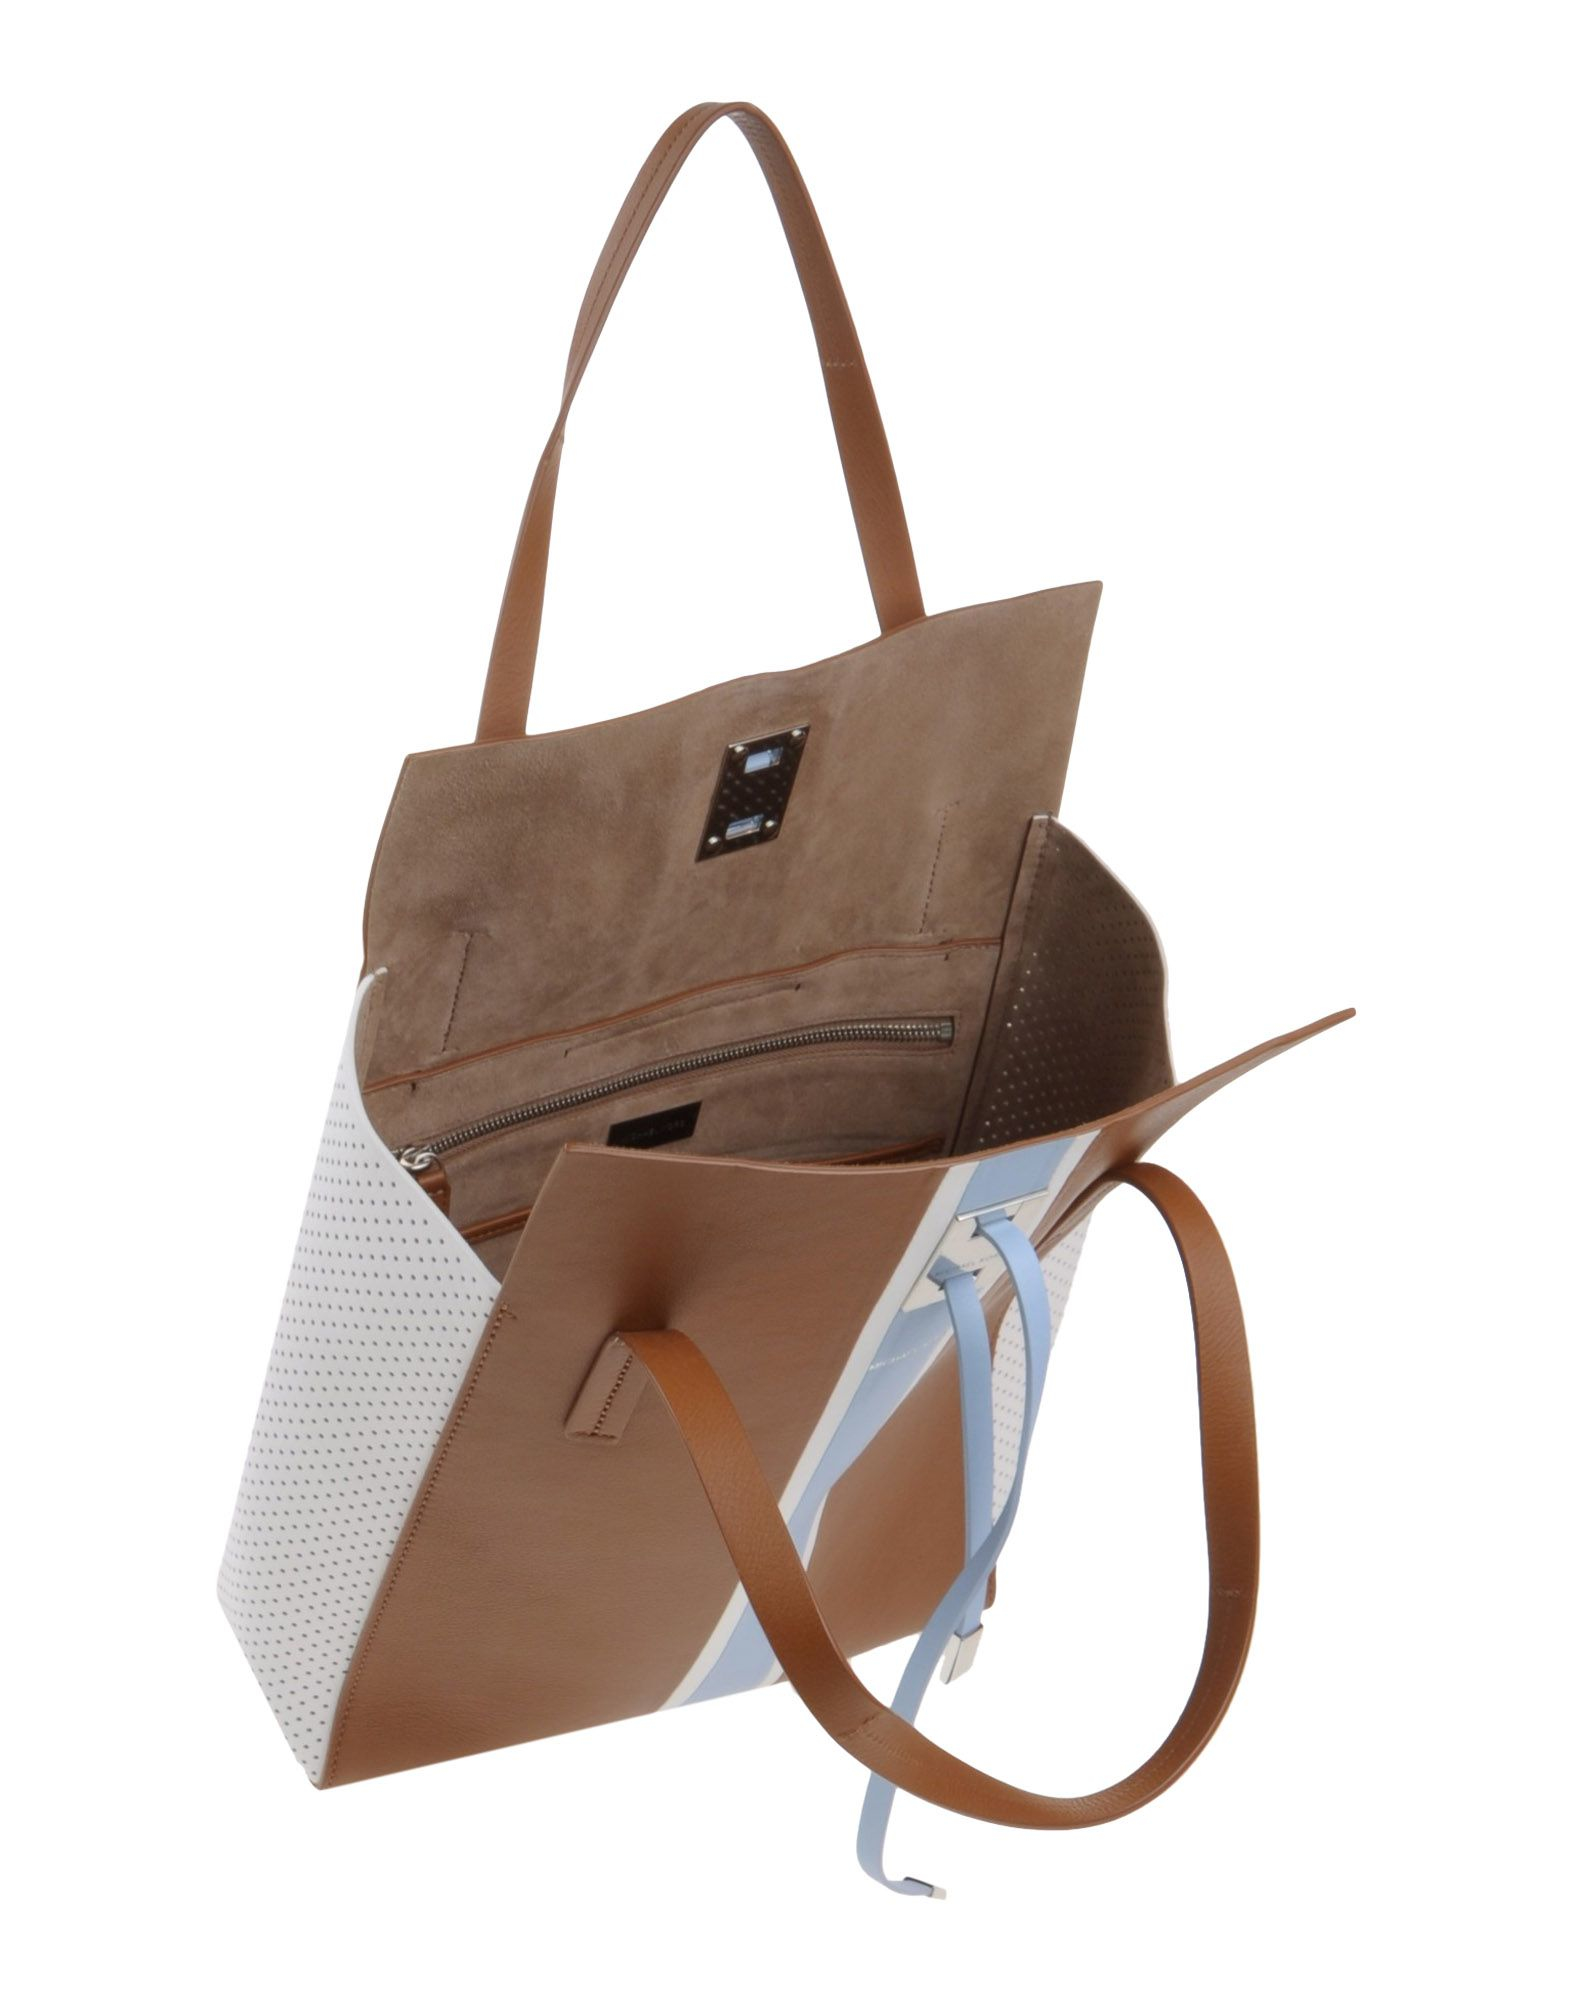 michael kors handbag in brown lyst. Black Bedroom Furniture Sets. Home Design Ideas